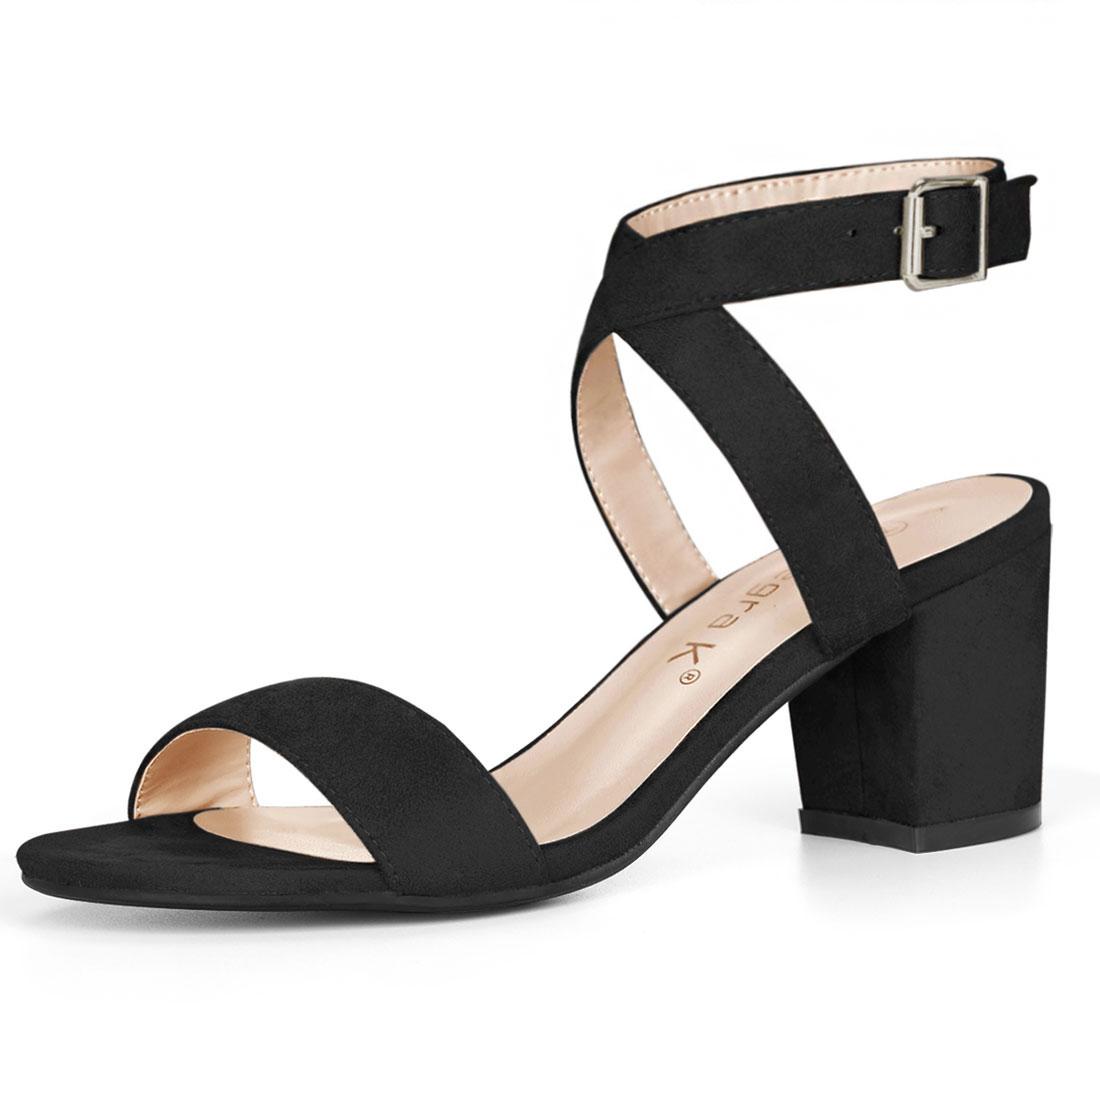 Allegra K Women's Crisscross Mid Block Heel Ankle Strap Sandals Black US 5